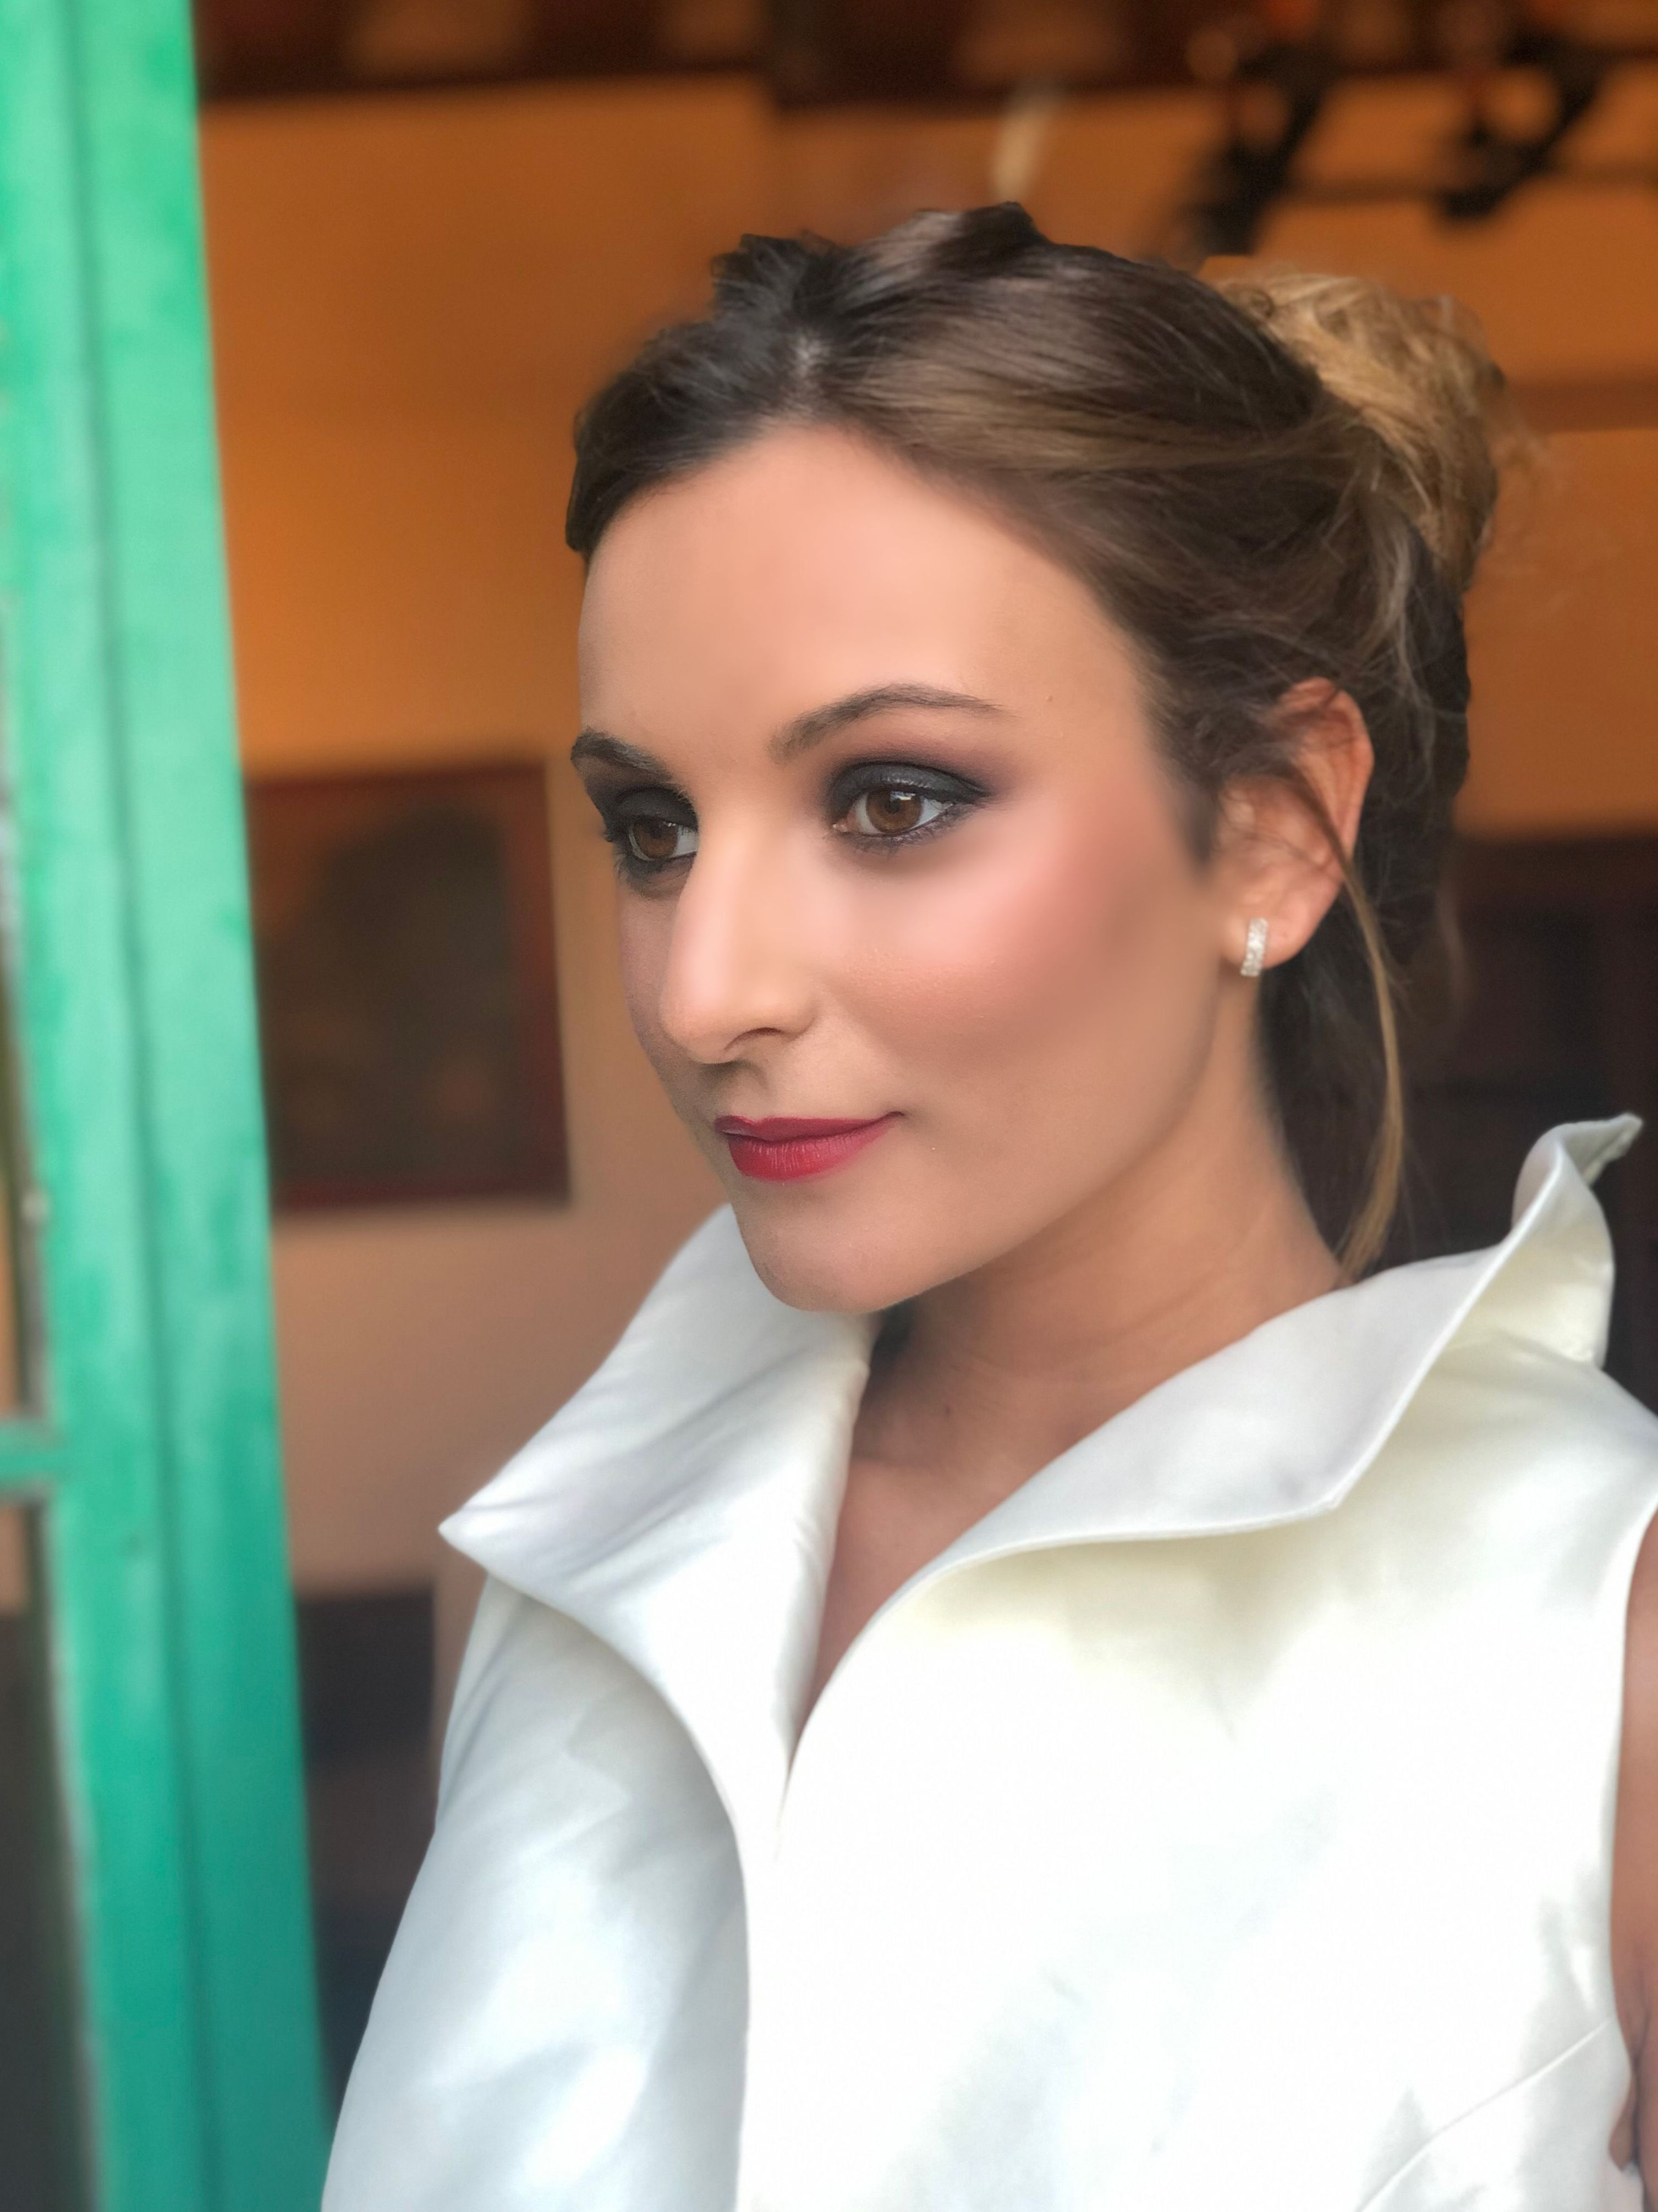 Maquillaje para sesión de fotos